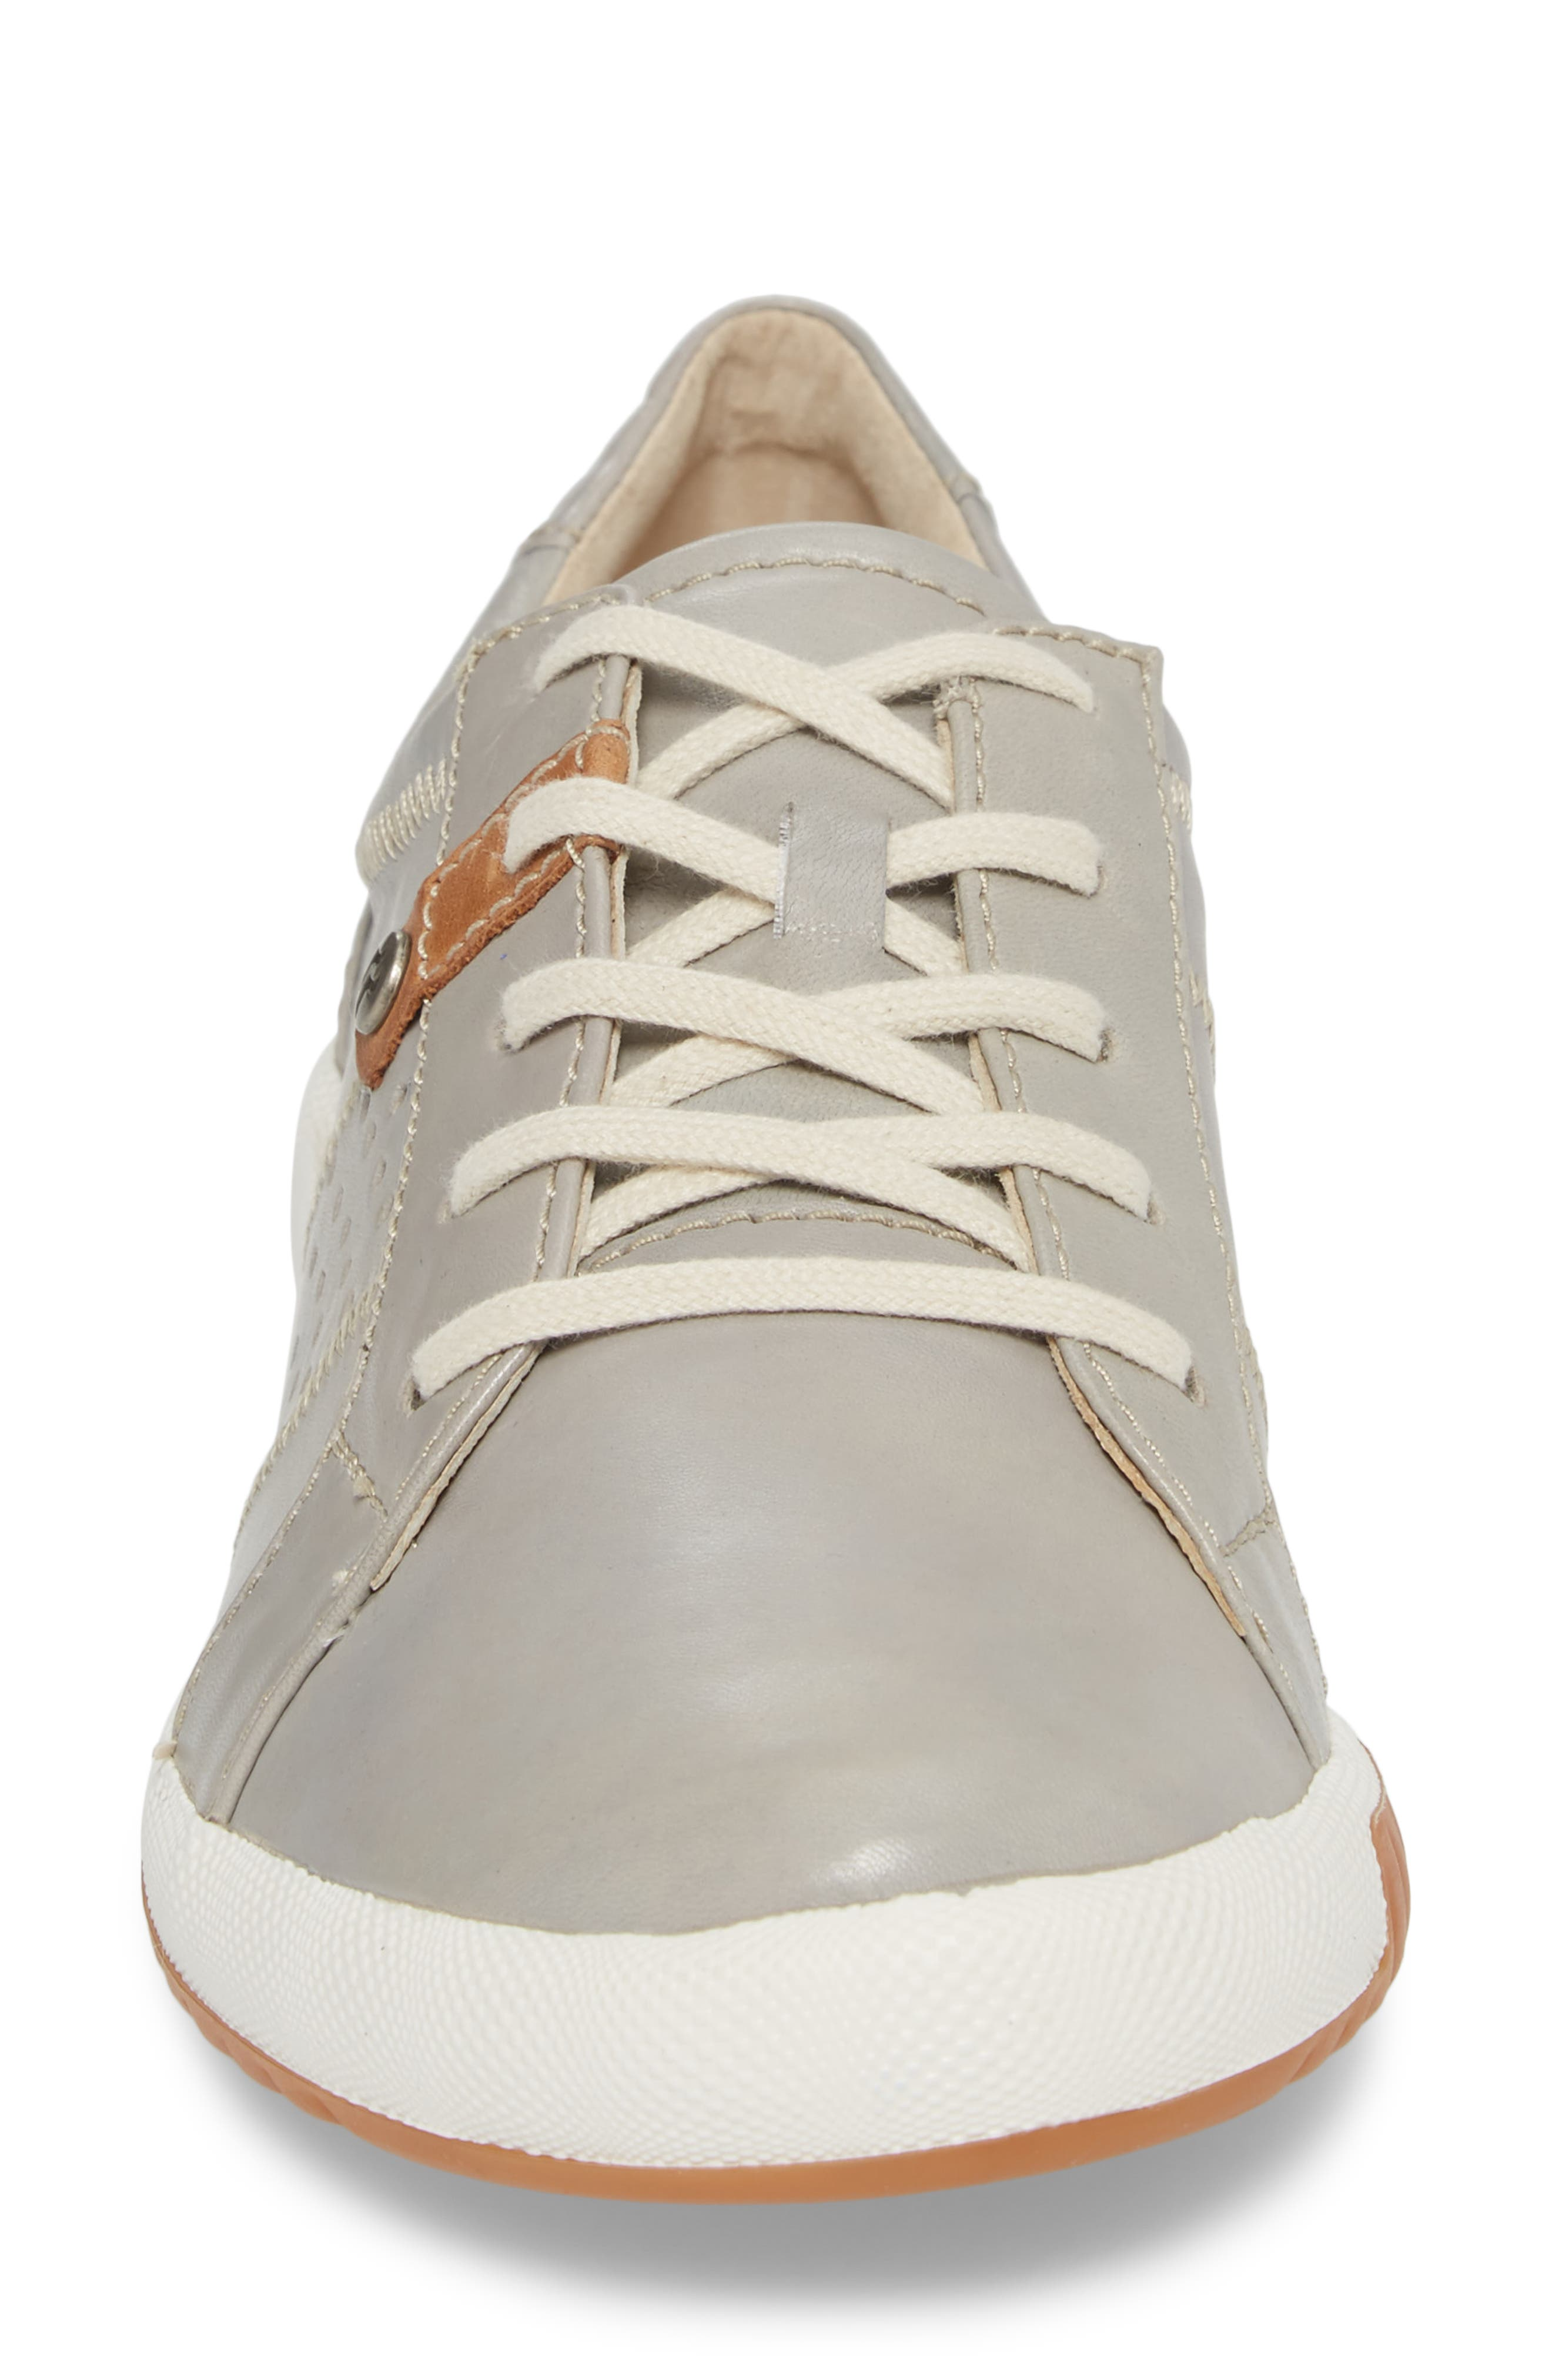 Cordoba 01 Sneaker,                             Alternate thumbnail 4, color,                             GREY LEATHER